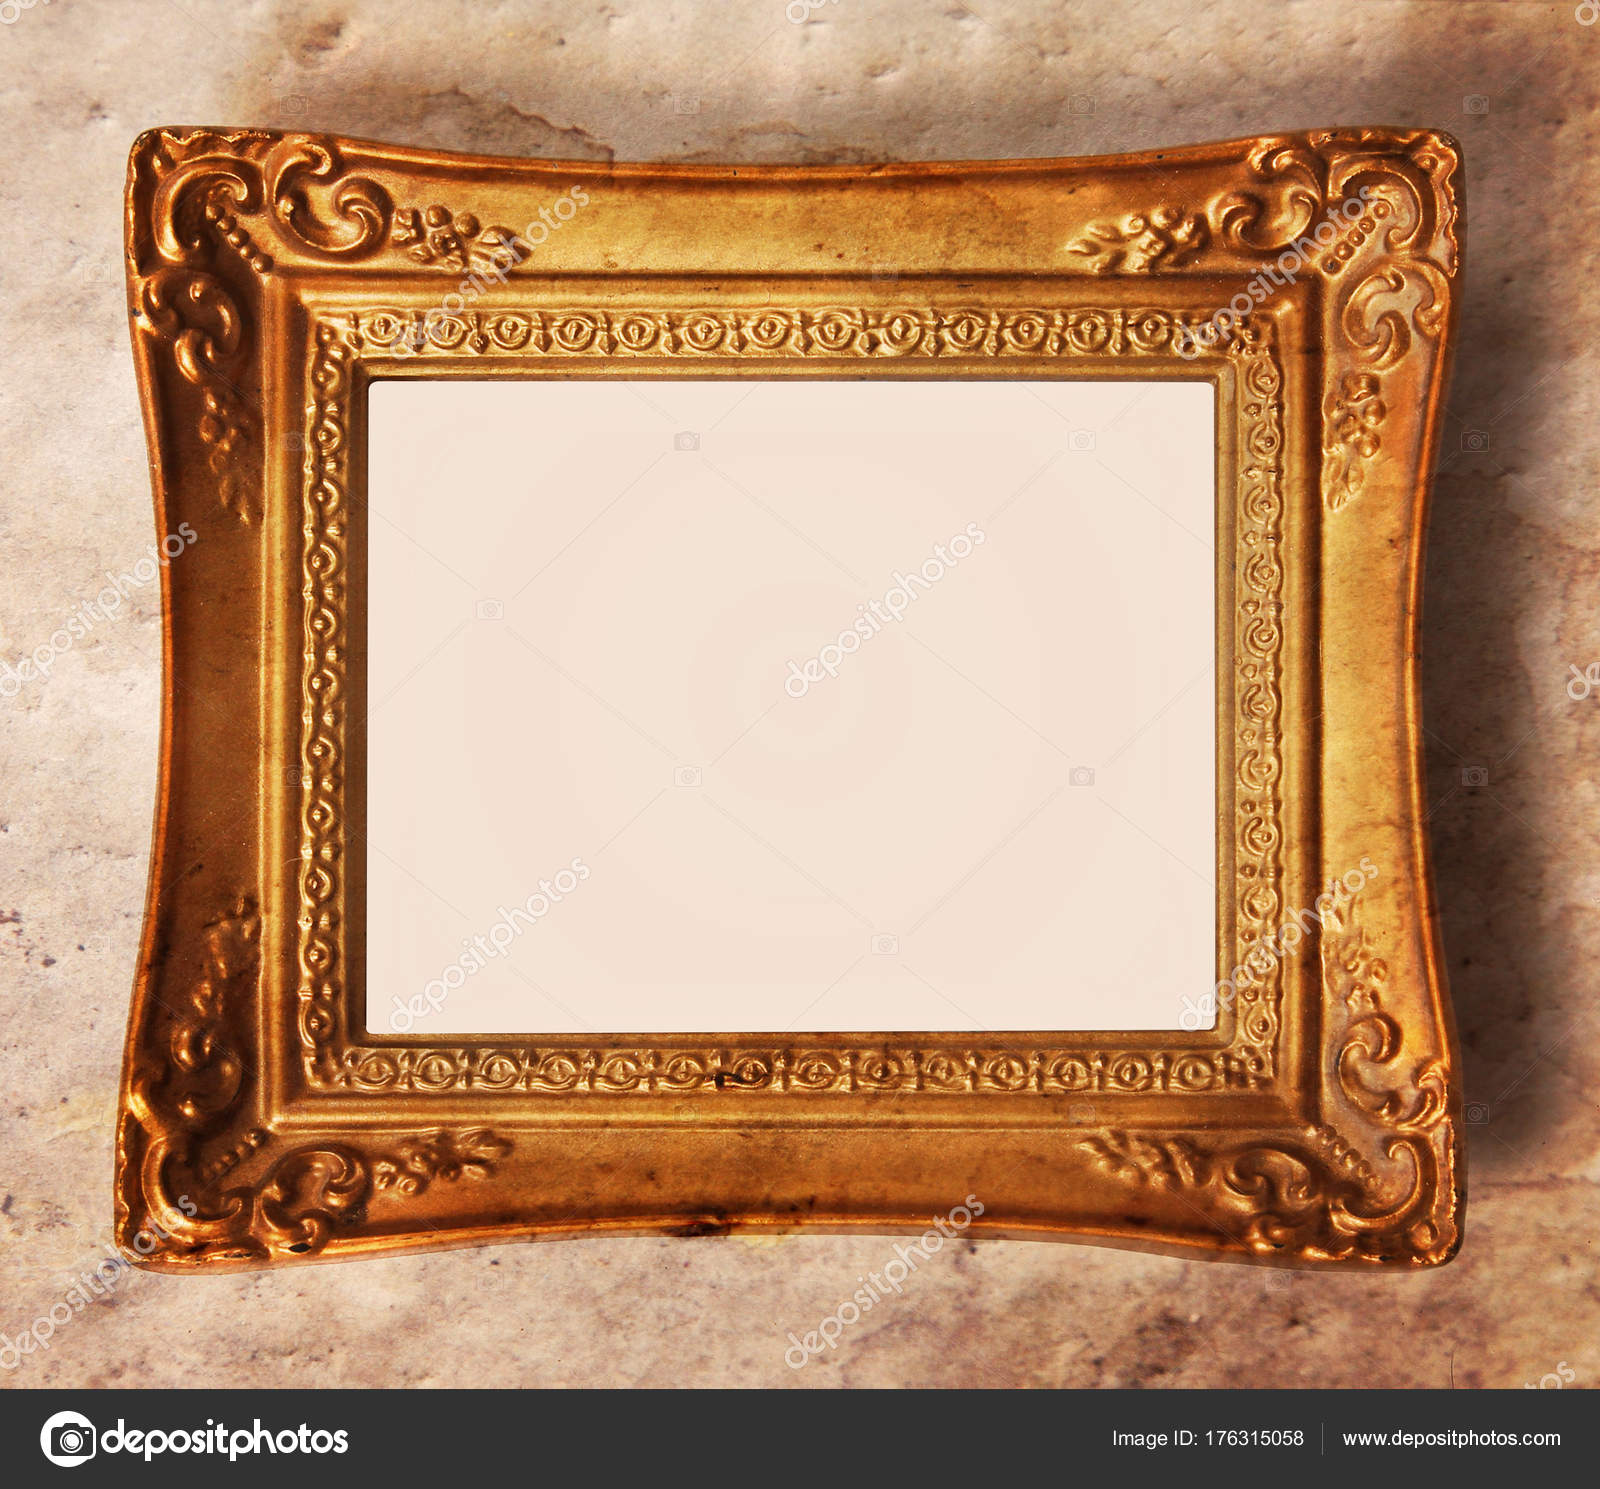 Vintage Bilderrahmen in Gold dekoriert — Stockfoto © graphicphoto ...